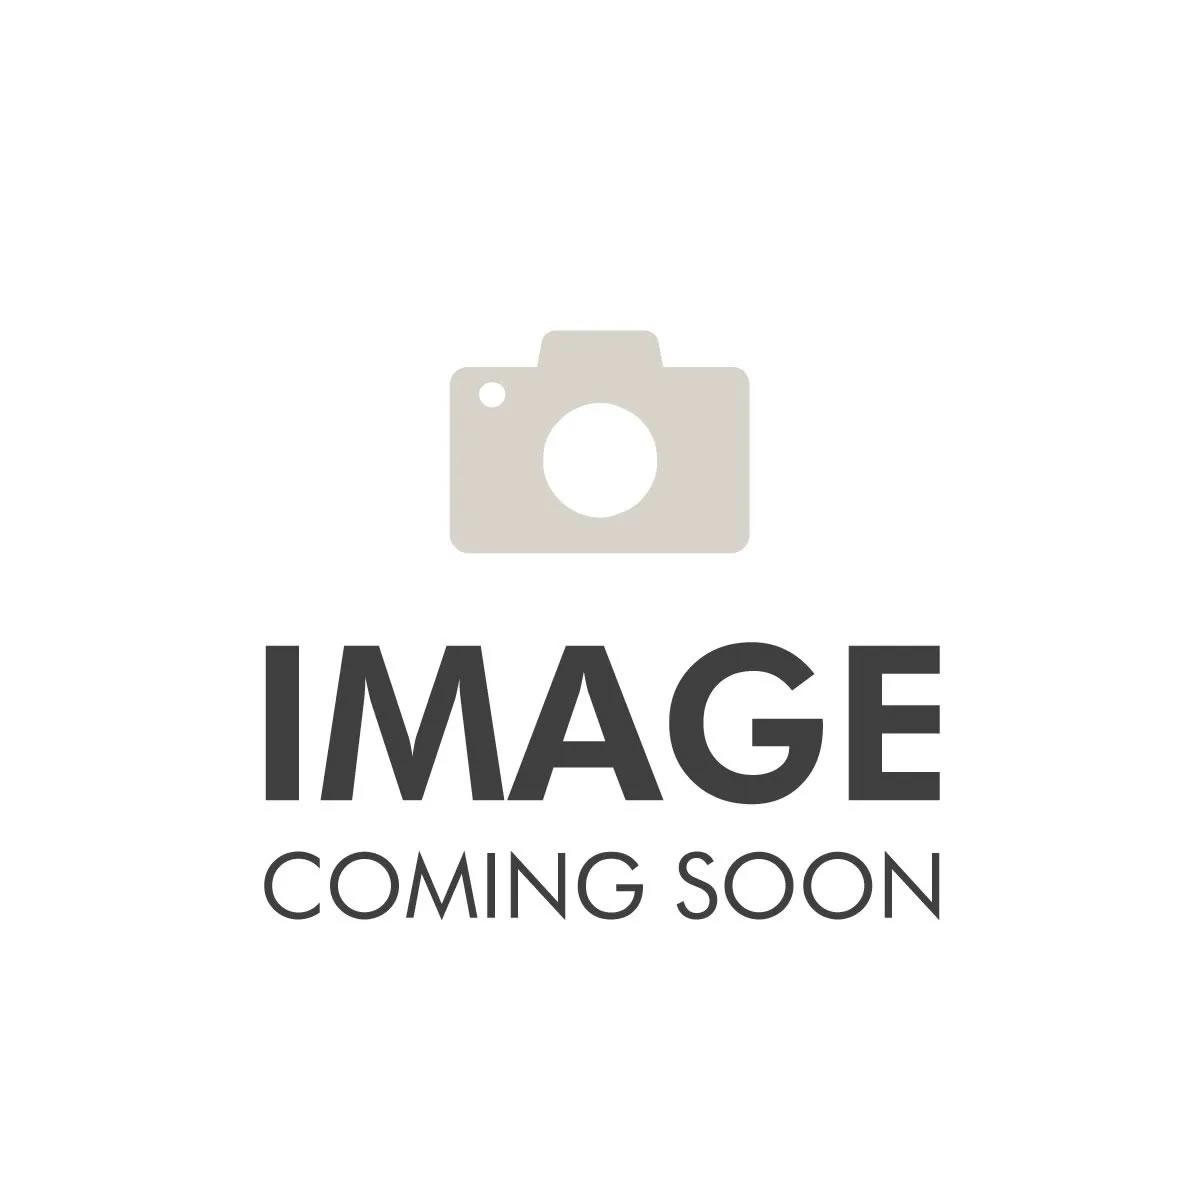 Transmission Shifter Trim, Chrome Automatic; 07-10 Jeep Wrangler JK